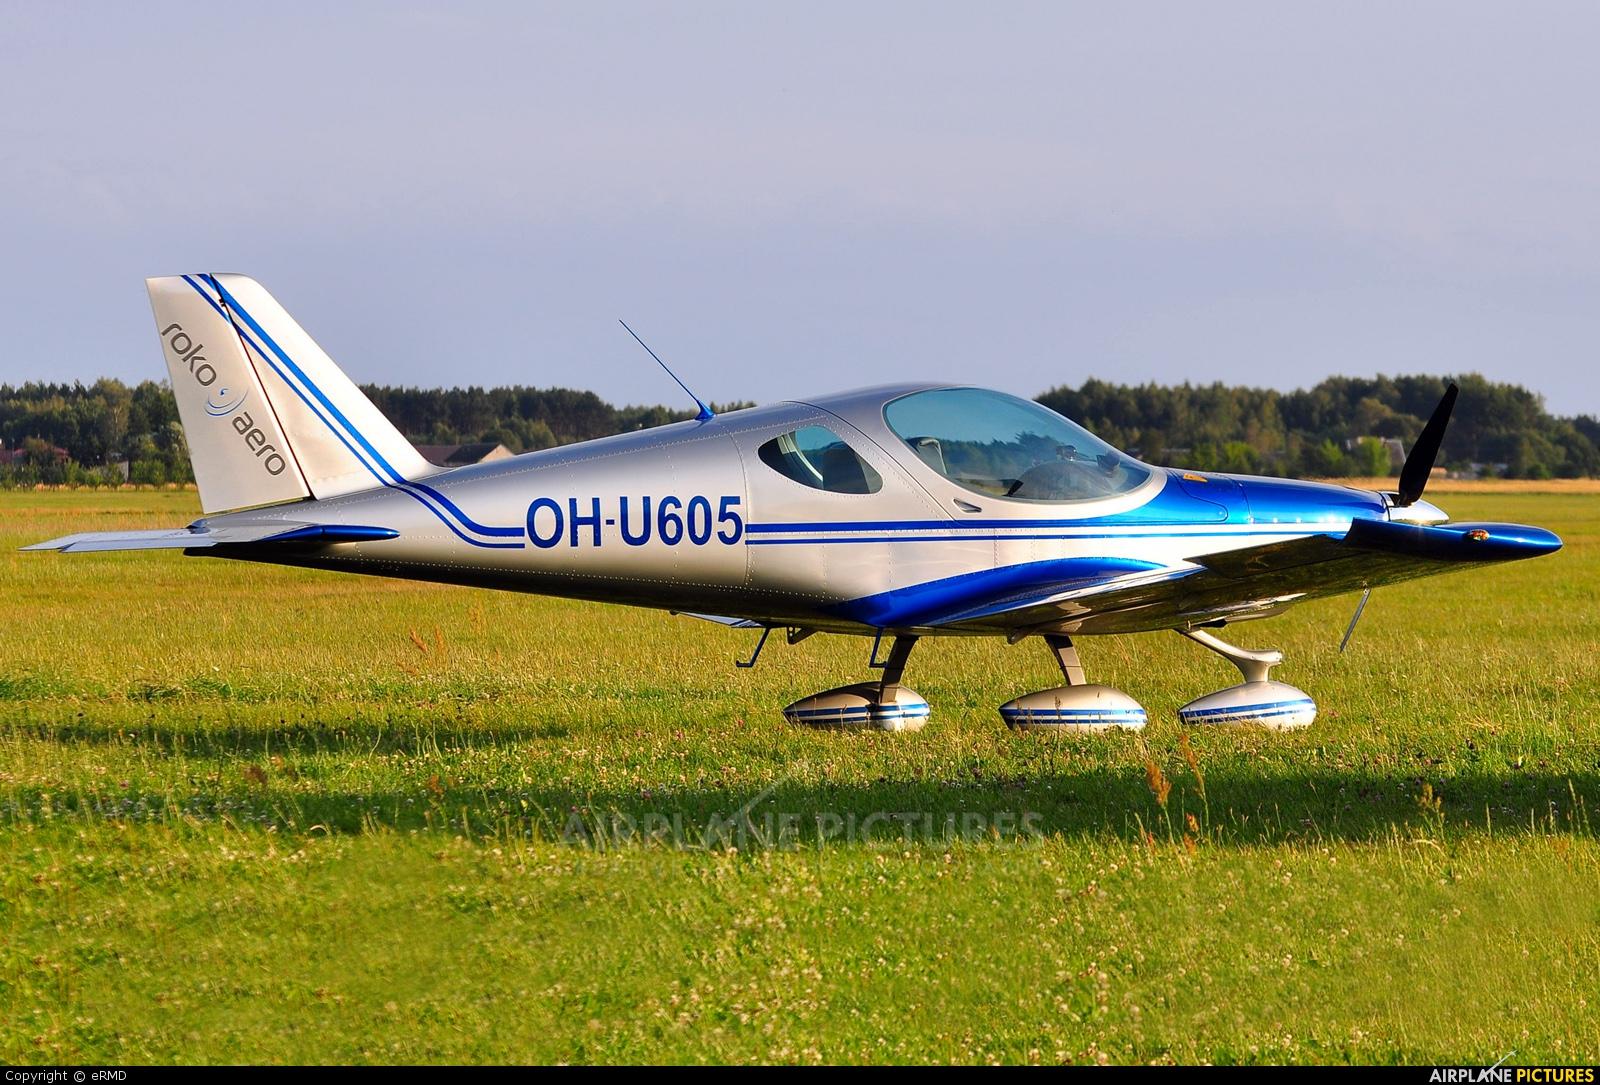 Private OH-U605 aircraft at Radom - Piastów